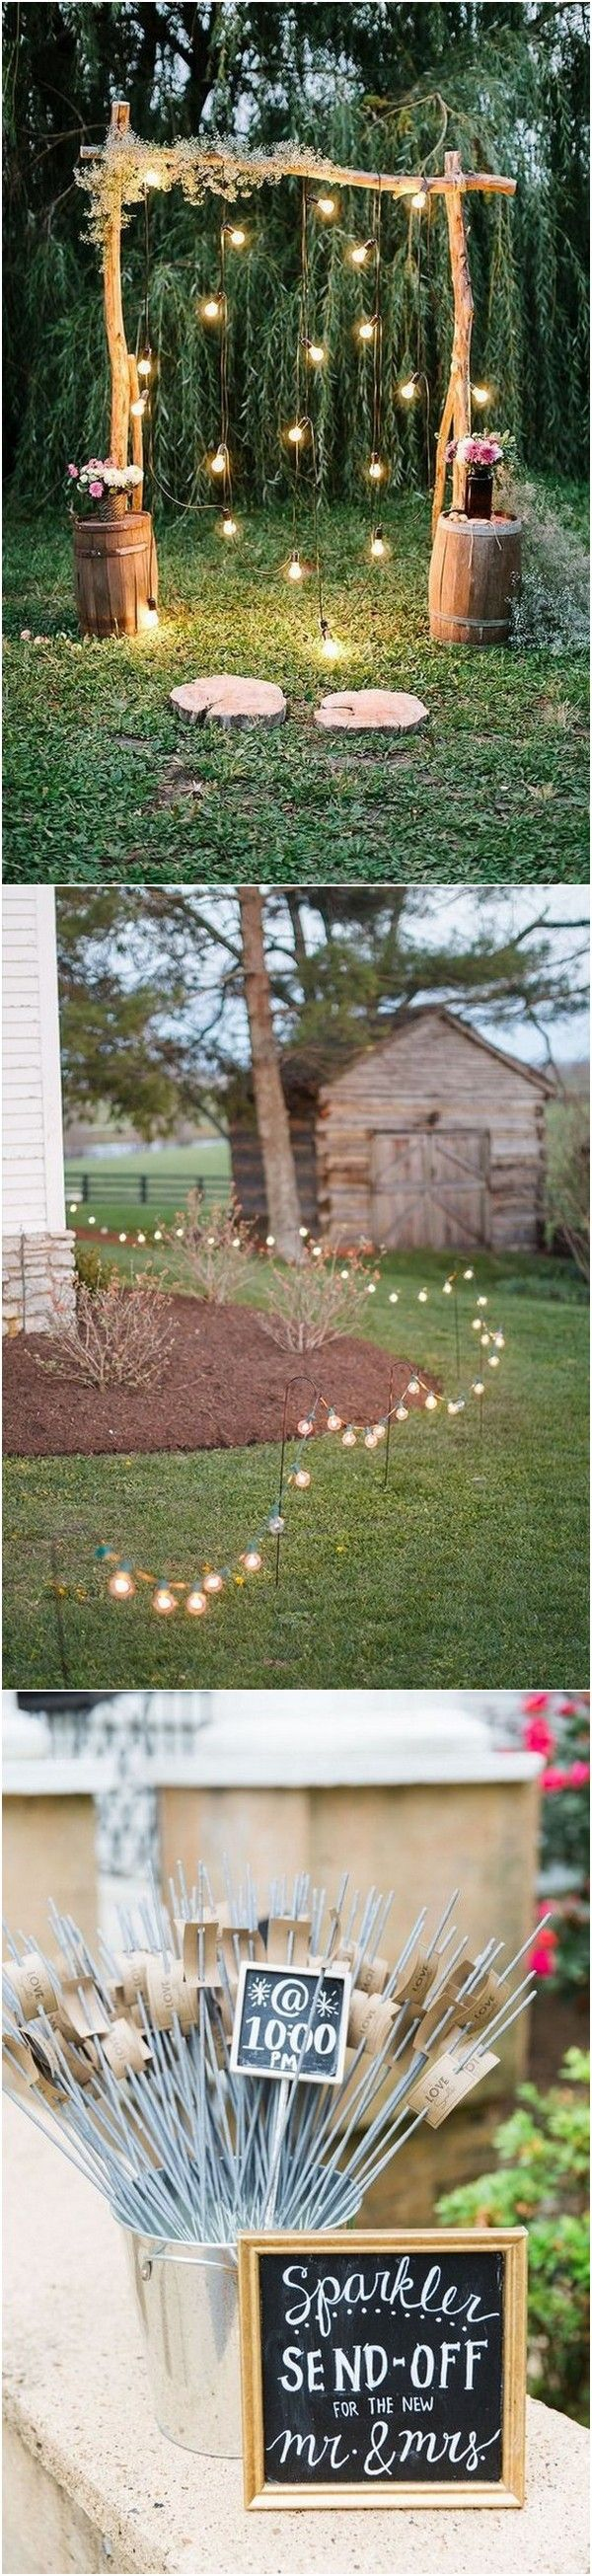 15 Creative Backyard Wedding Ideas On a Budget | Quirky ...